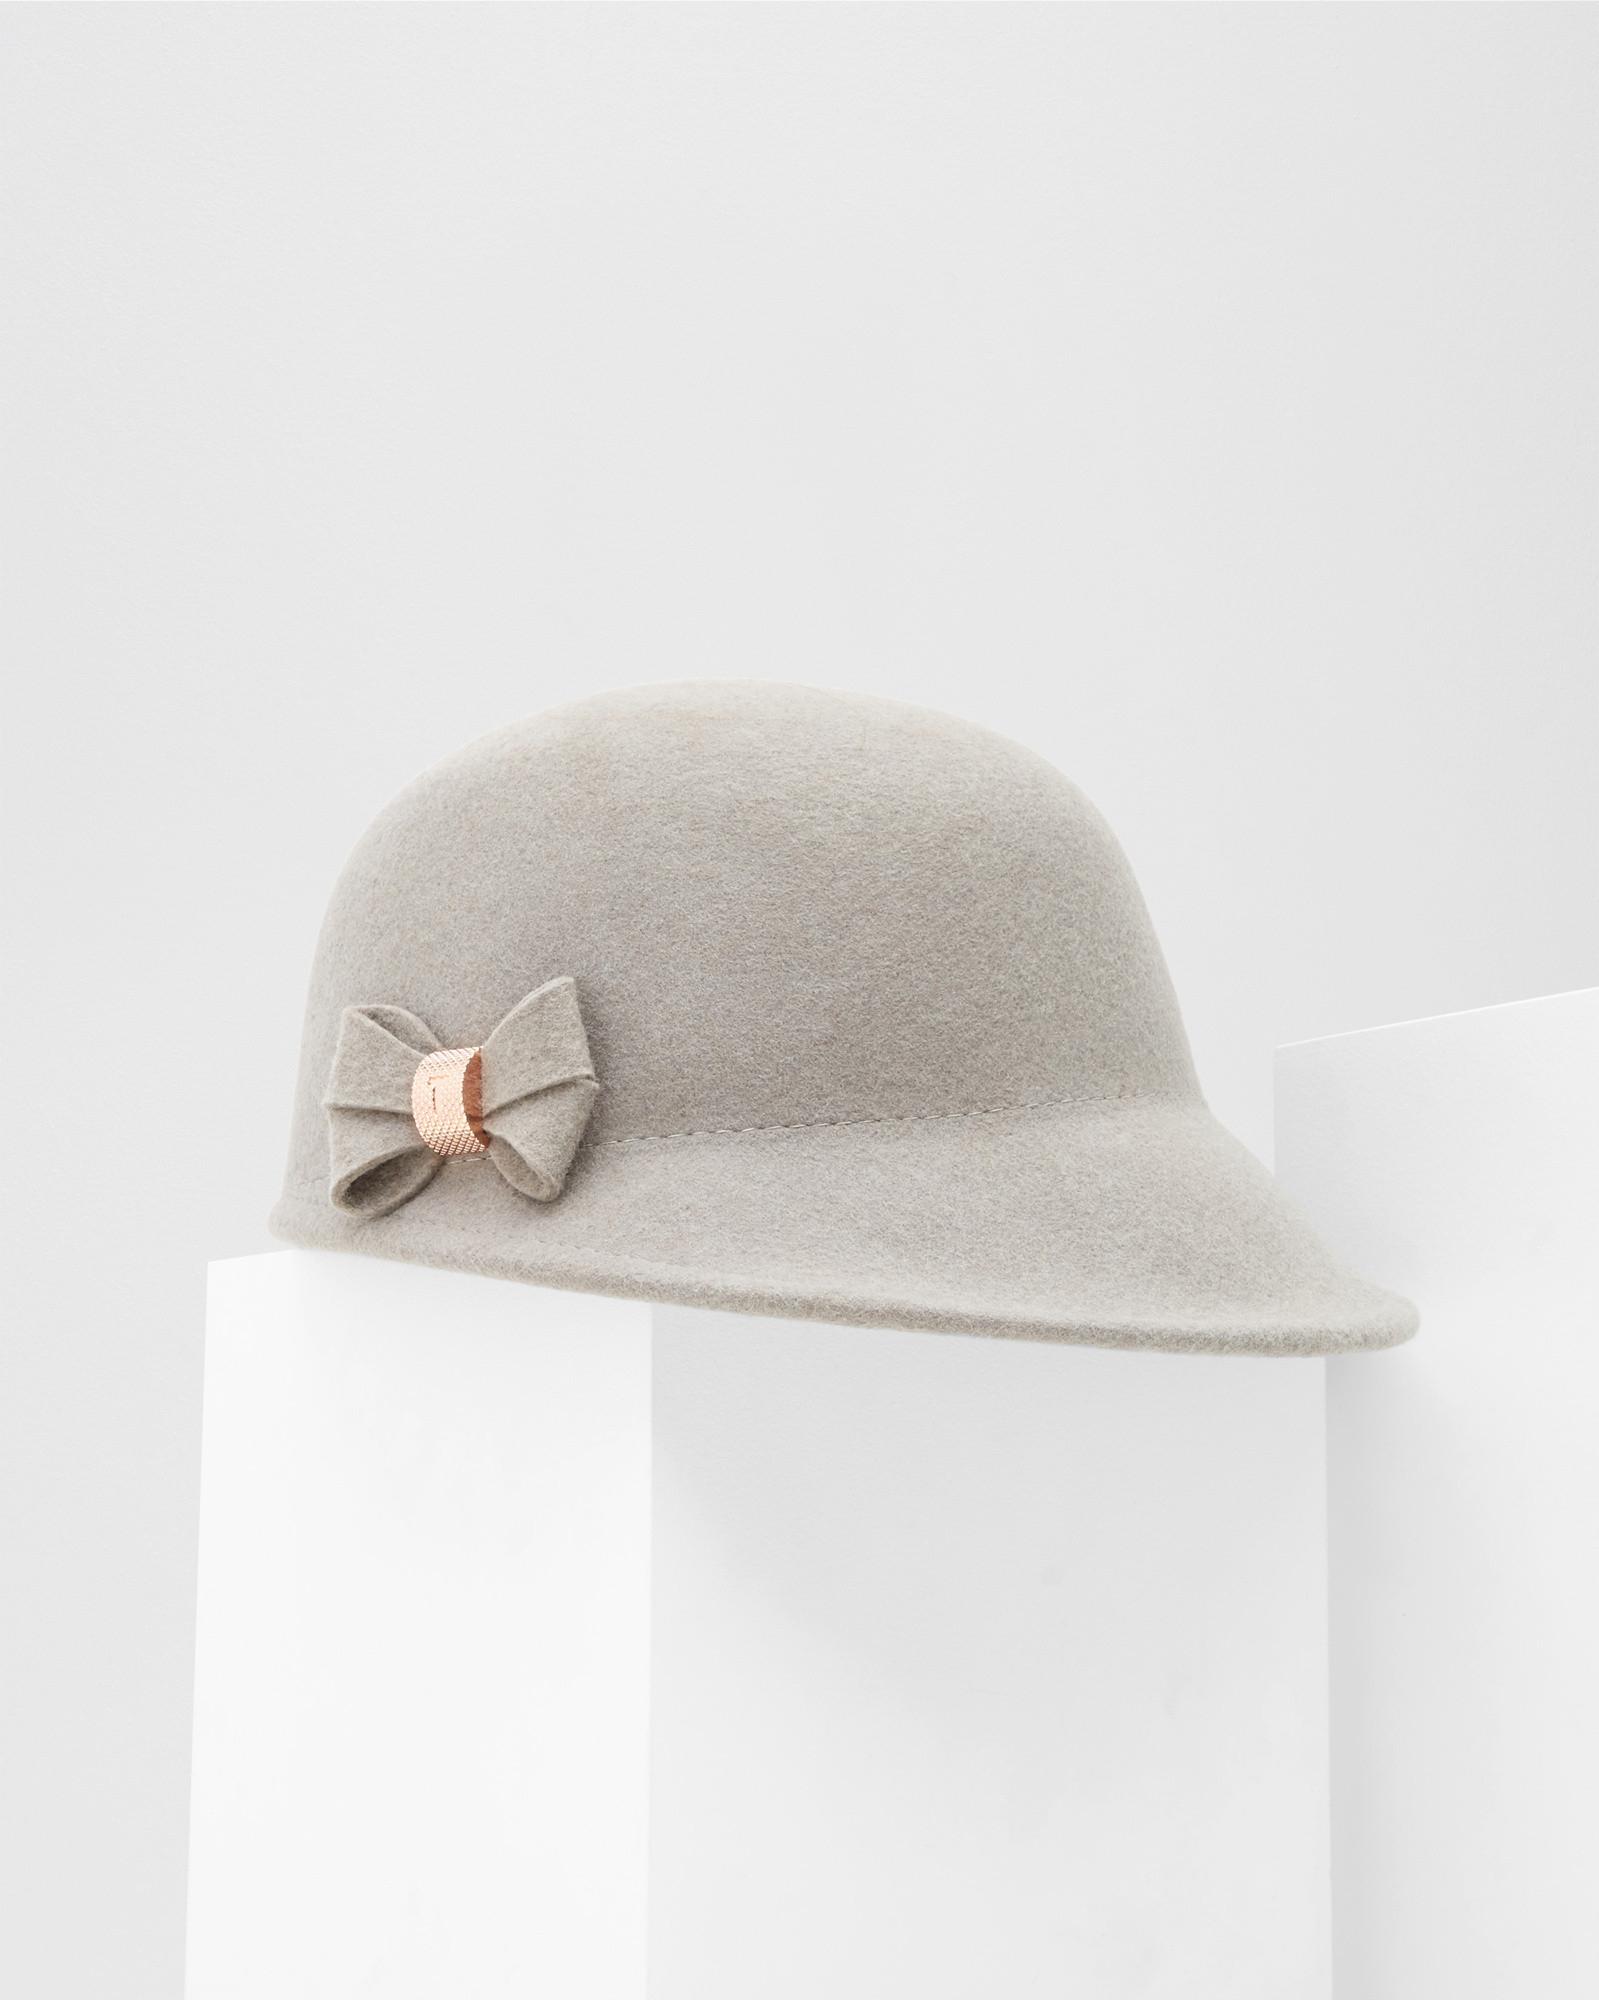 b903e04c10a5e Lyst - Ted Baker Mini Bow Cap